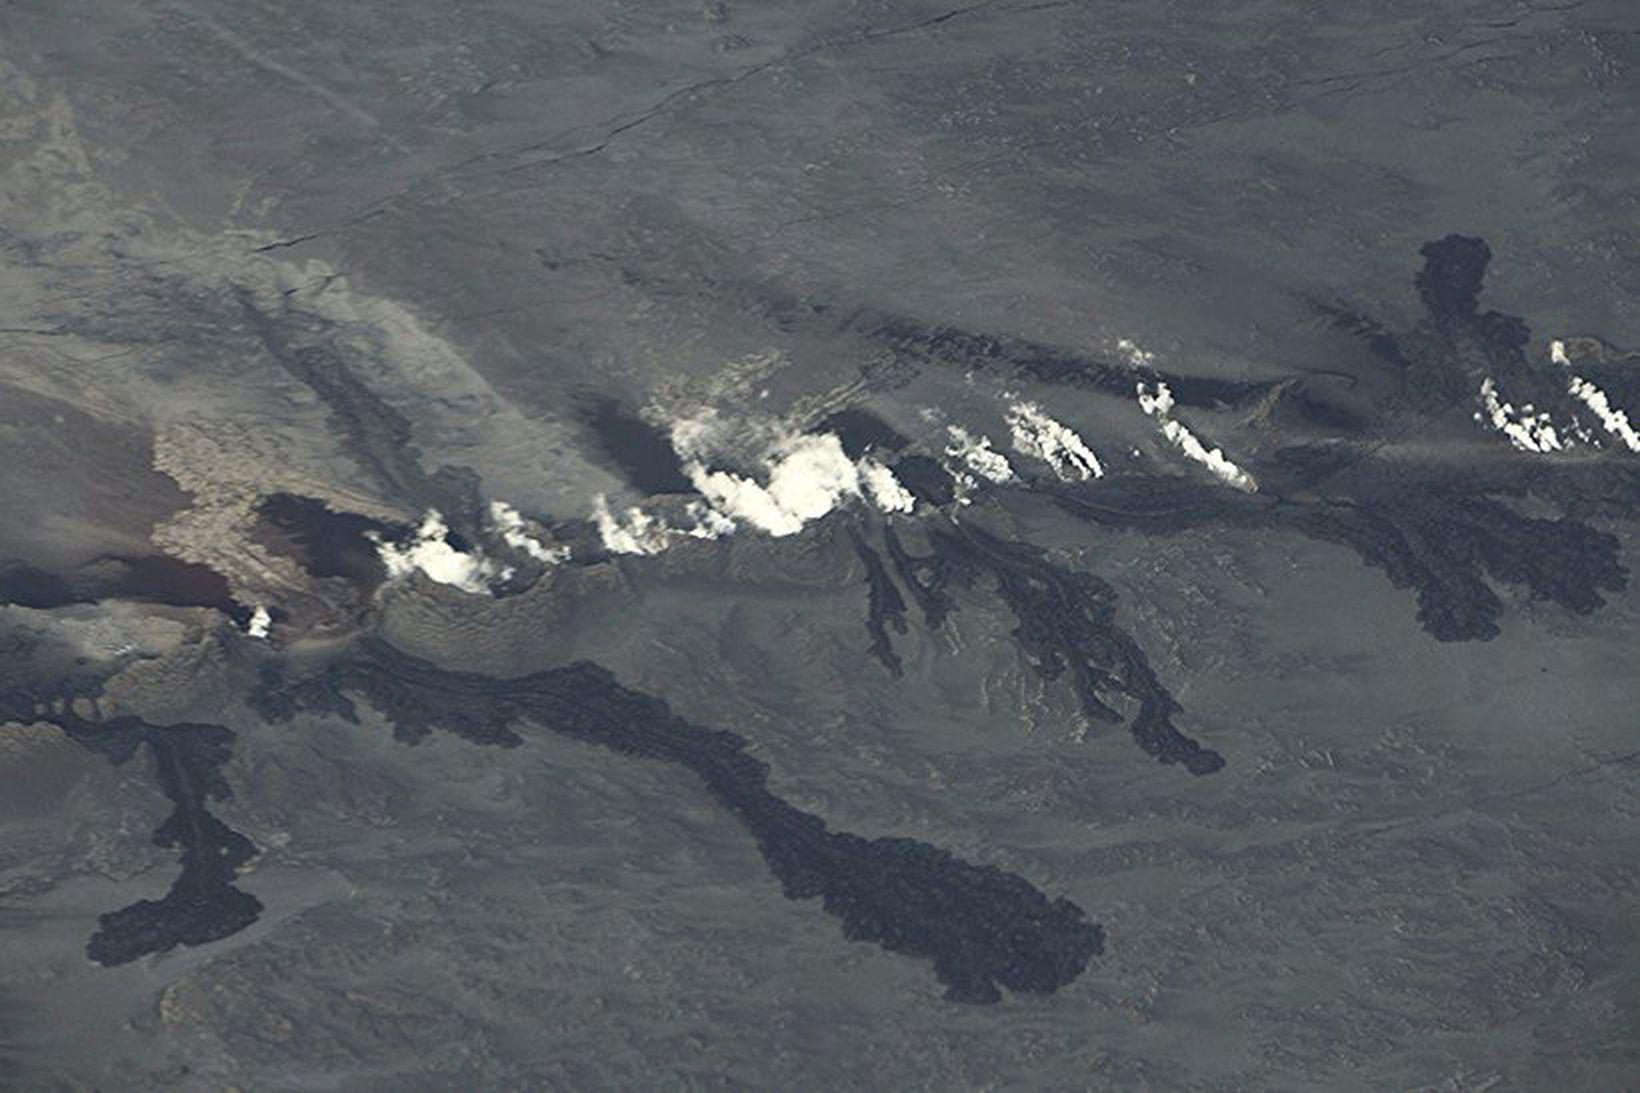 The Holuhraun eruption site. The rift extends 1.000 meters.